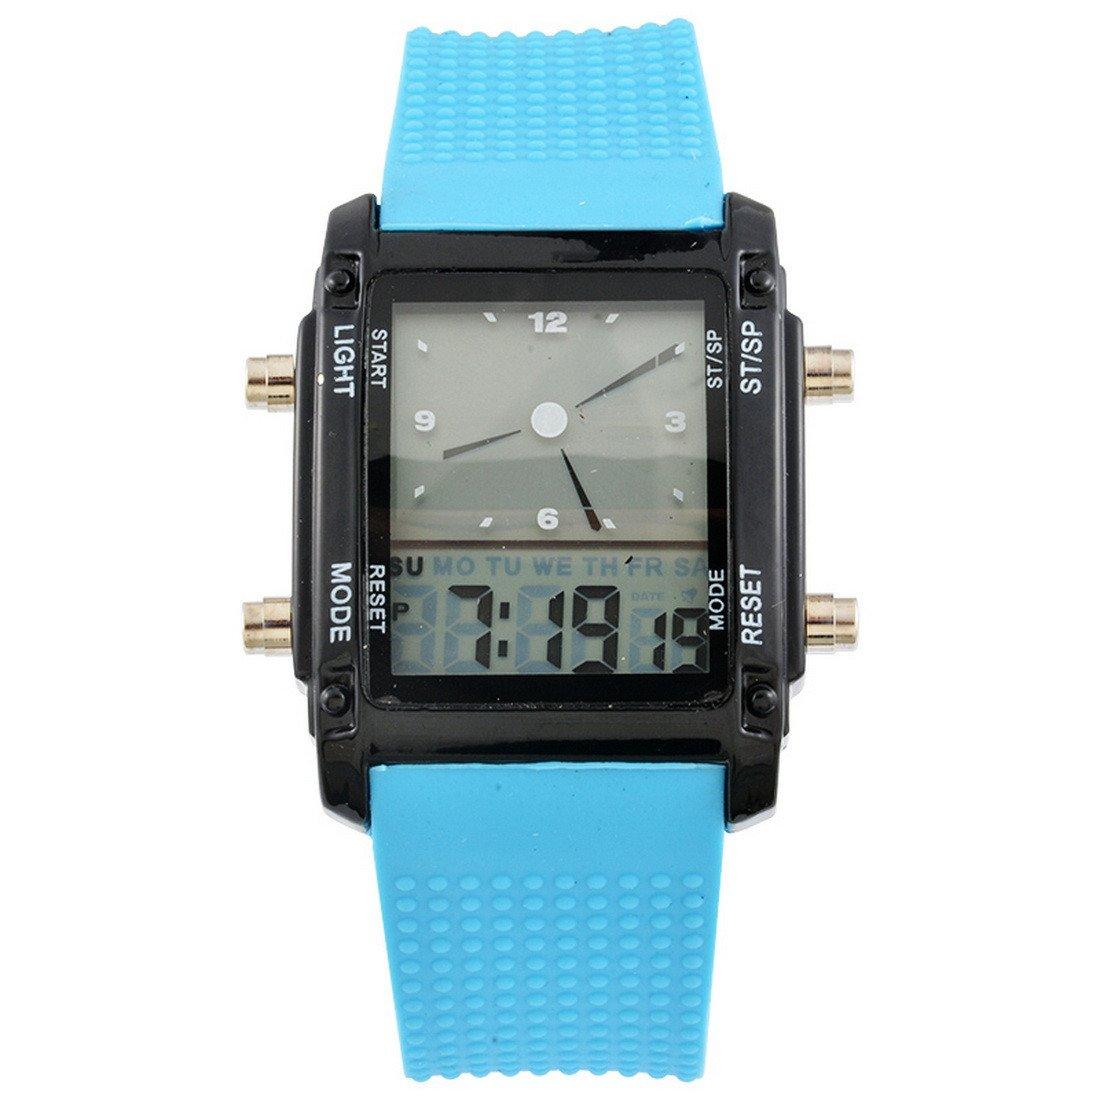 rainbabe-Rechteck-Zifferblatt-Sport-LED-Luminous-Dual-Smart-Armbanduhr-mit-Gummi-Watchband-26-cm